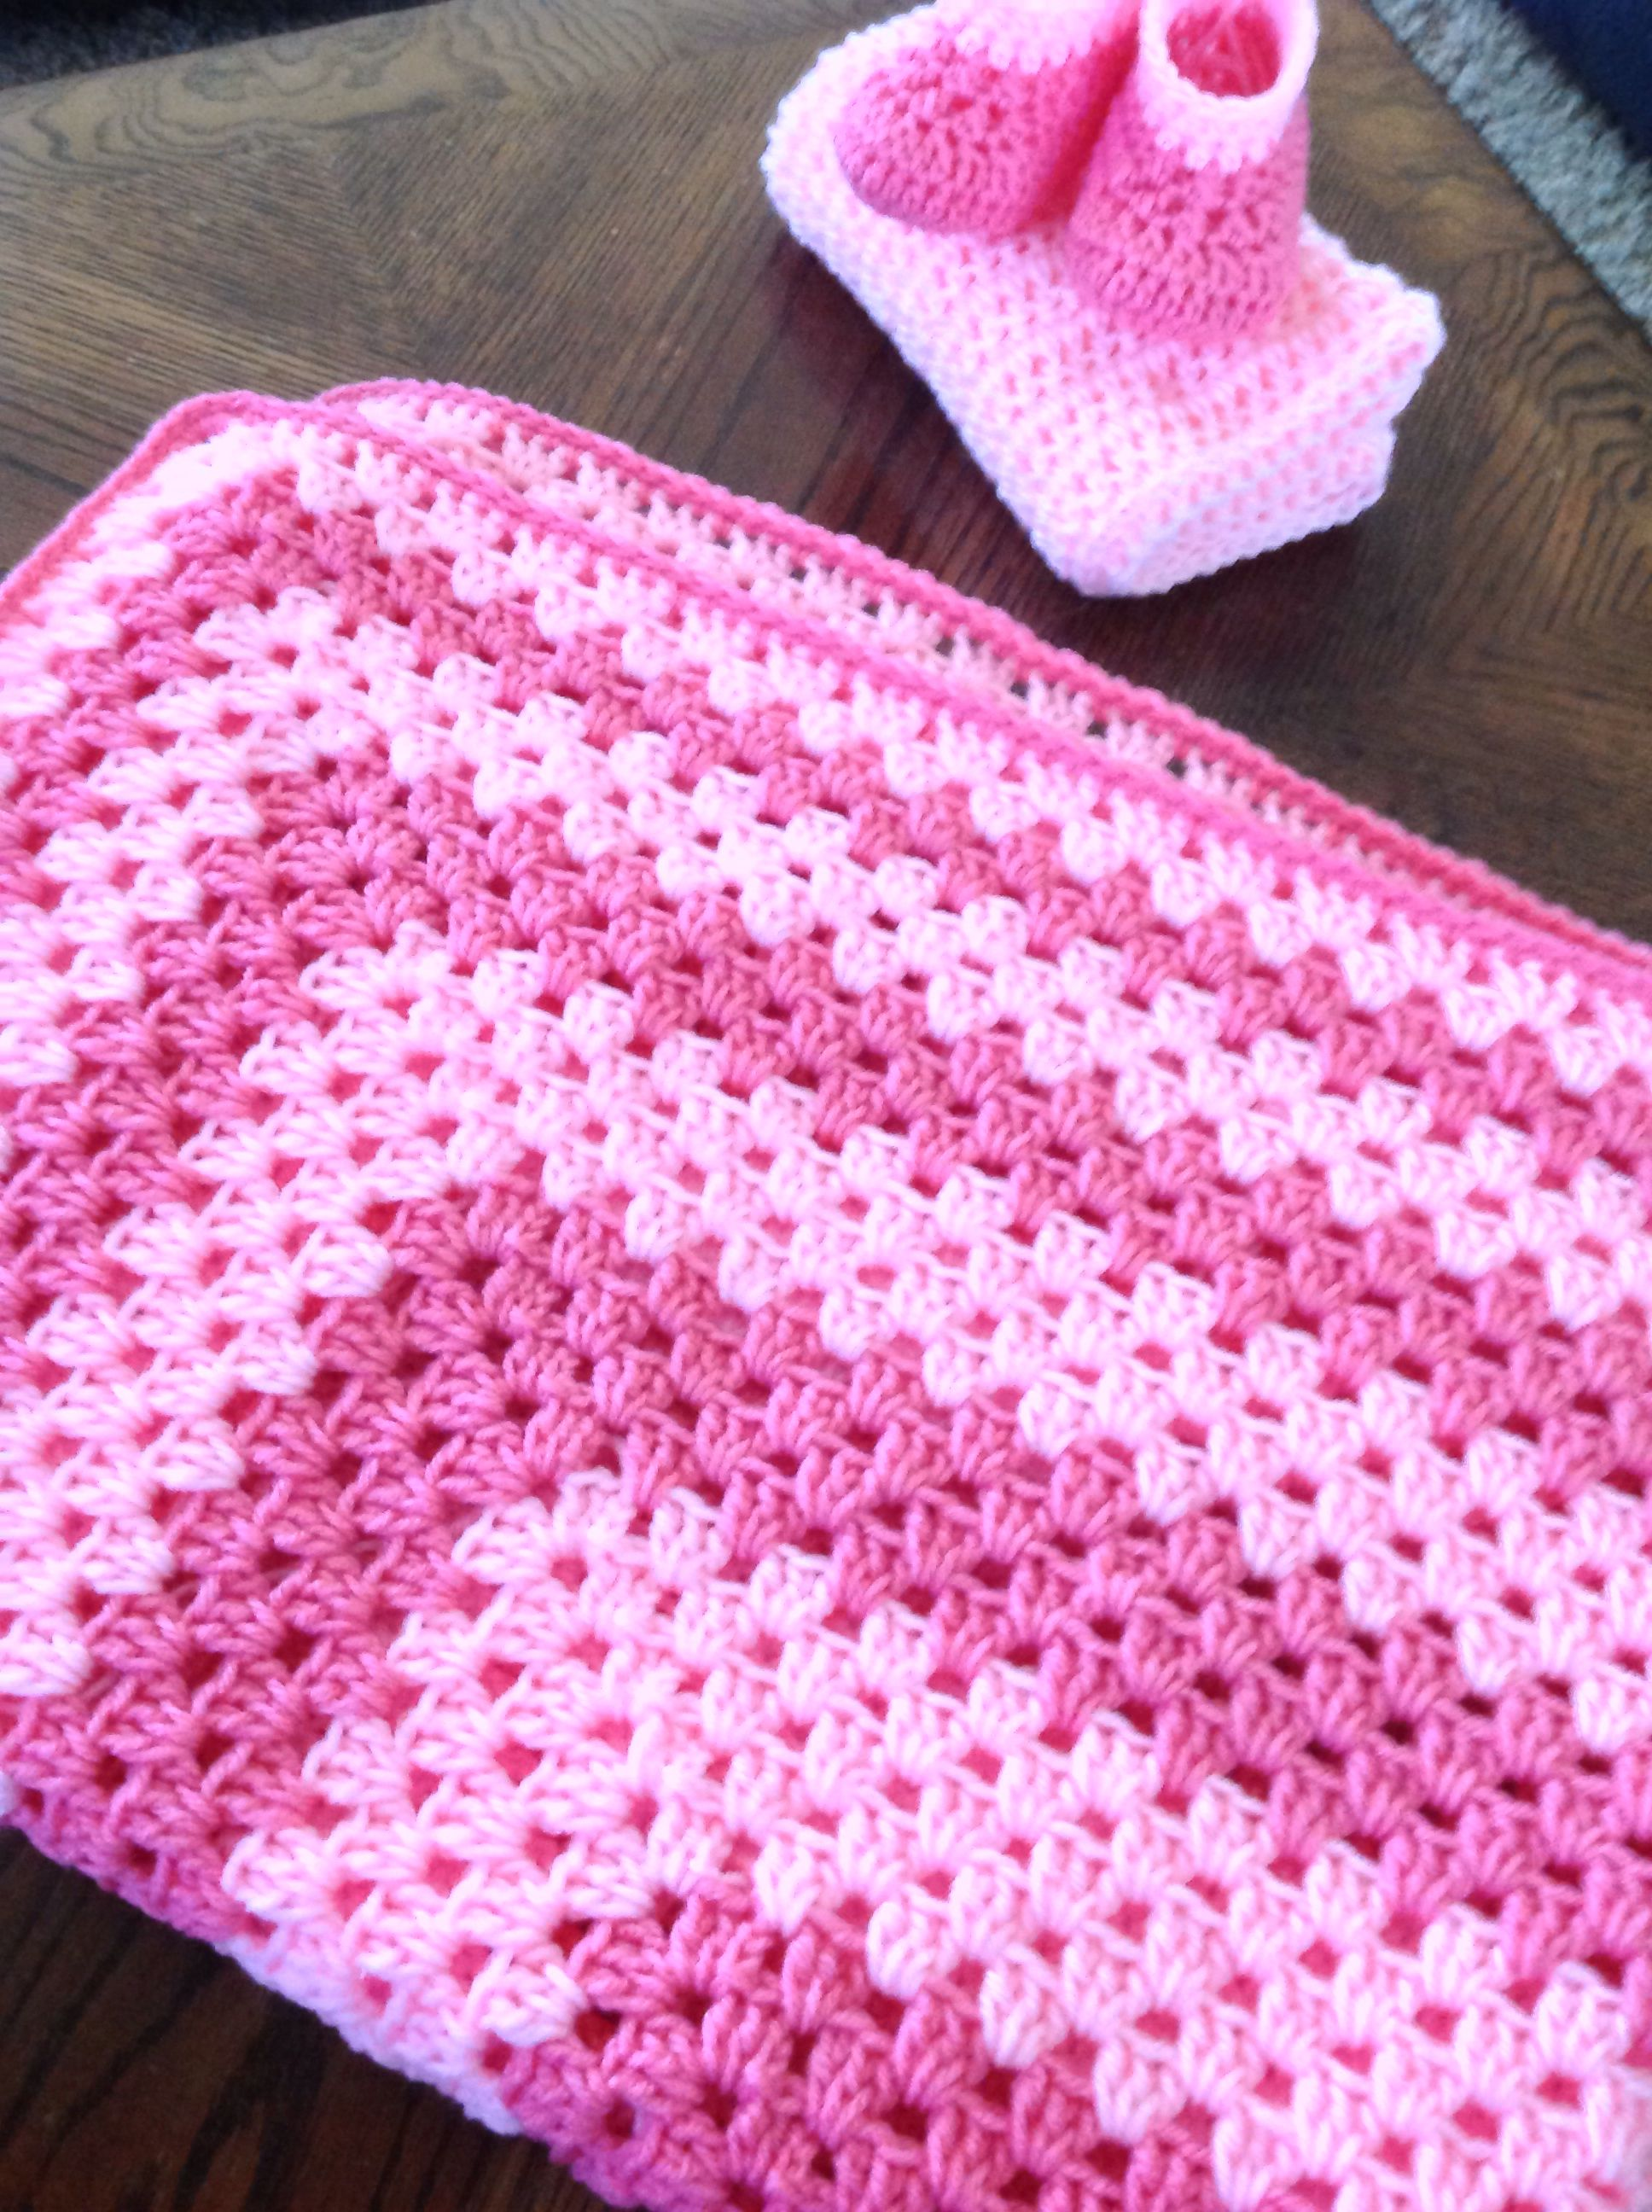 Crocheting Granny Square Blanket : Crochet granny square blanket Crochet Pinterest